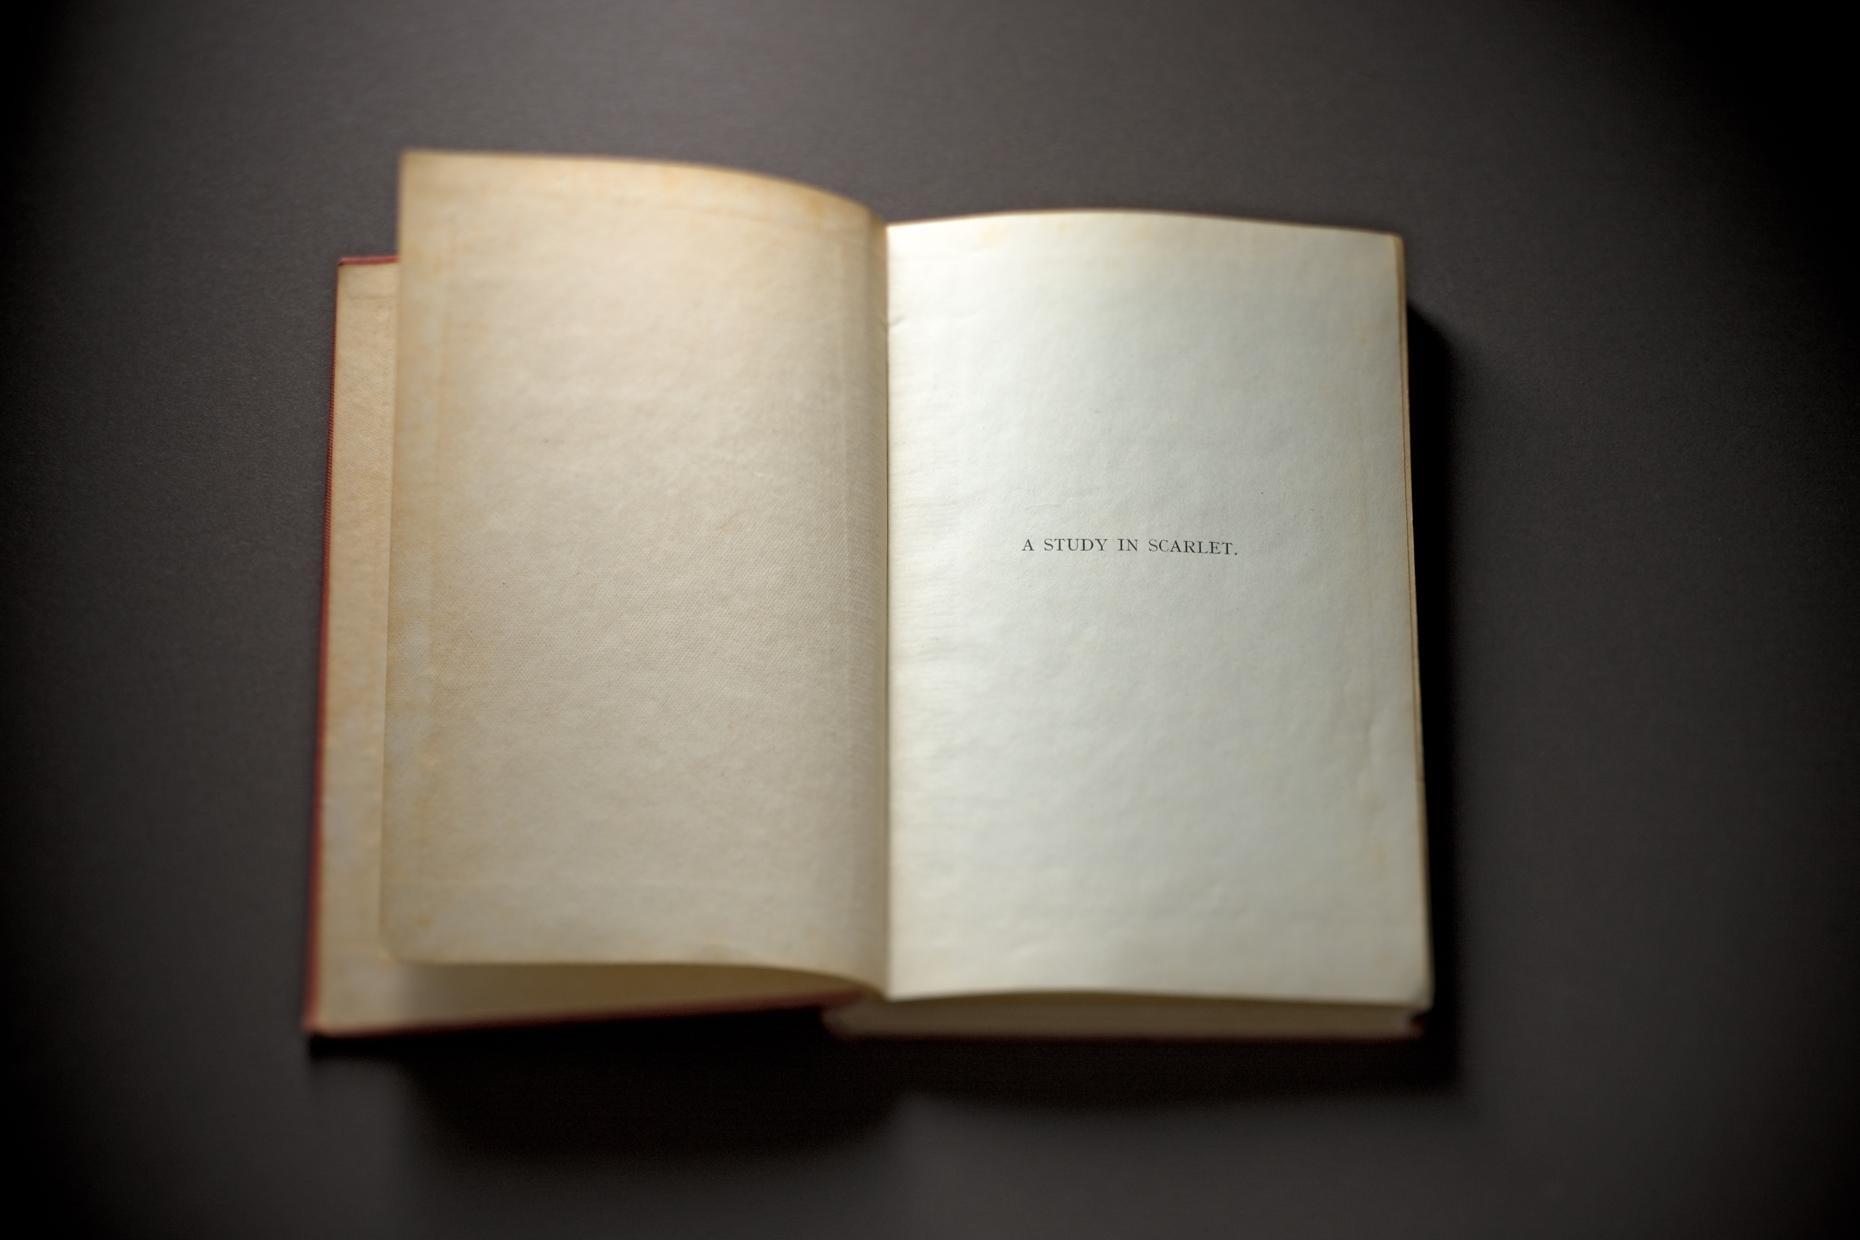 Product Photography StillLife Derek Israelsen Inside a Book